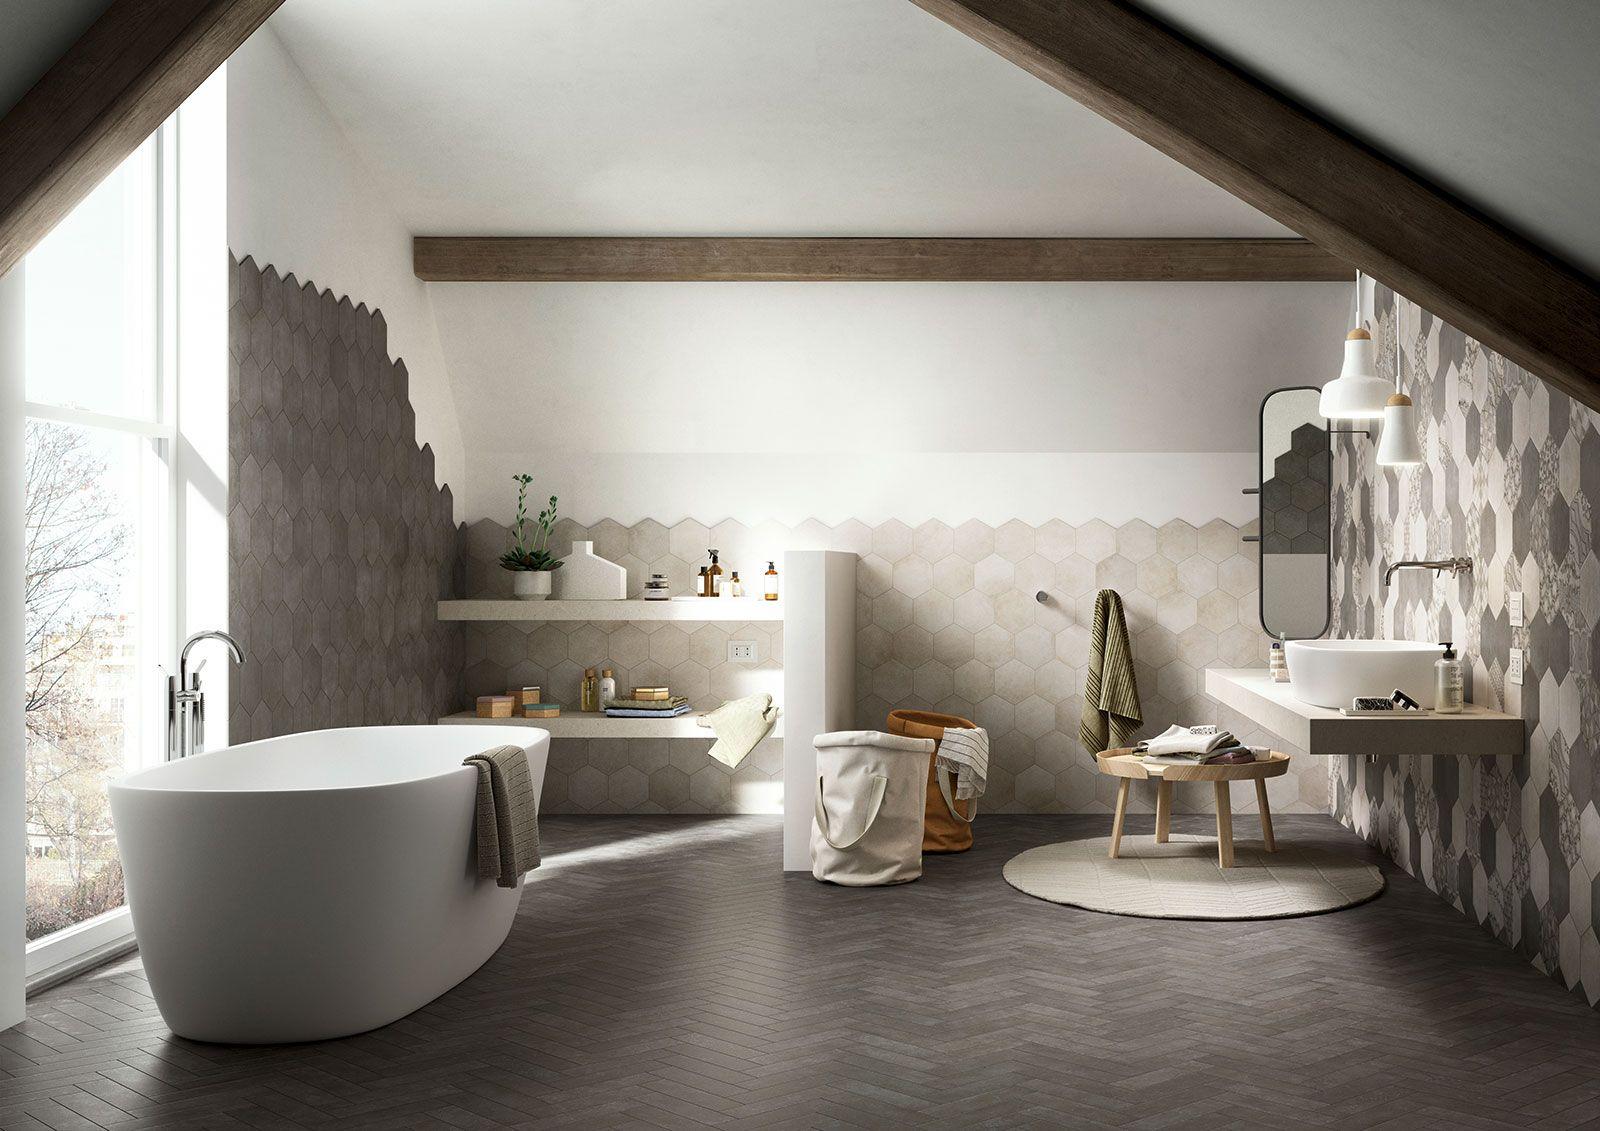 Clays - Porcelain tiles for floors and walls   Marazzi   Progetti da ...